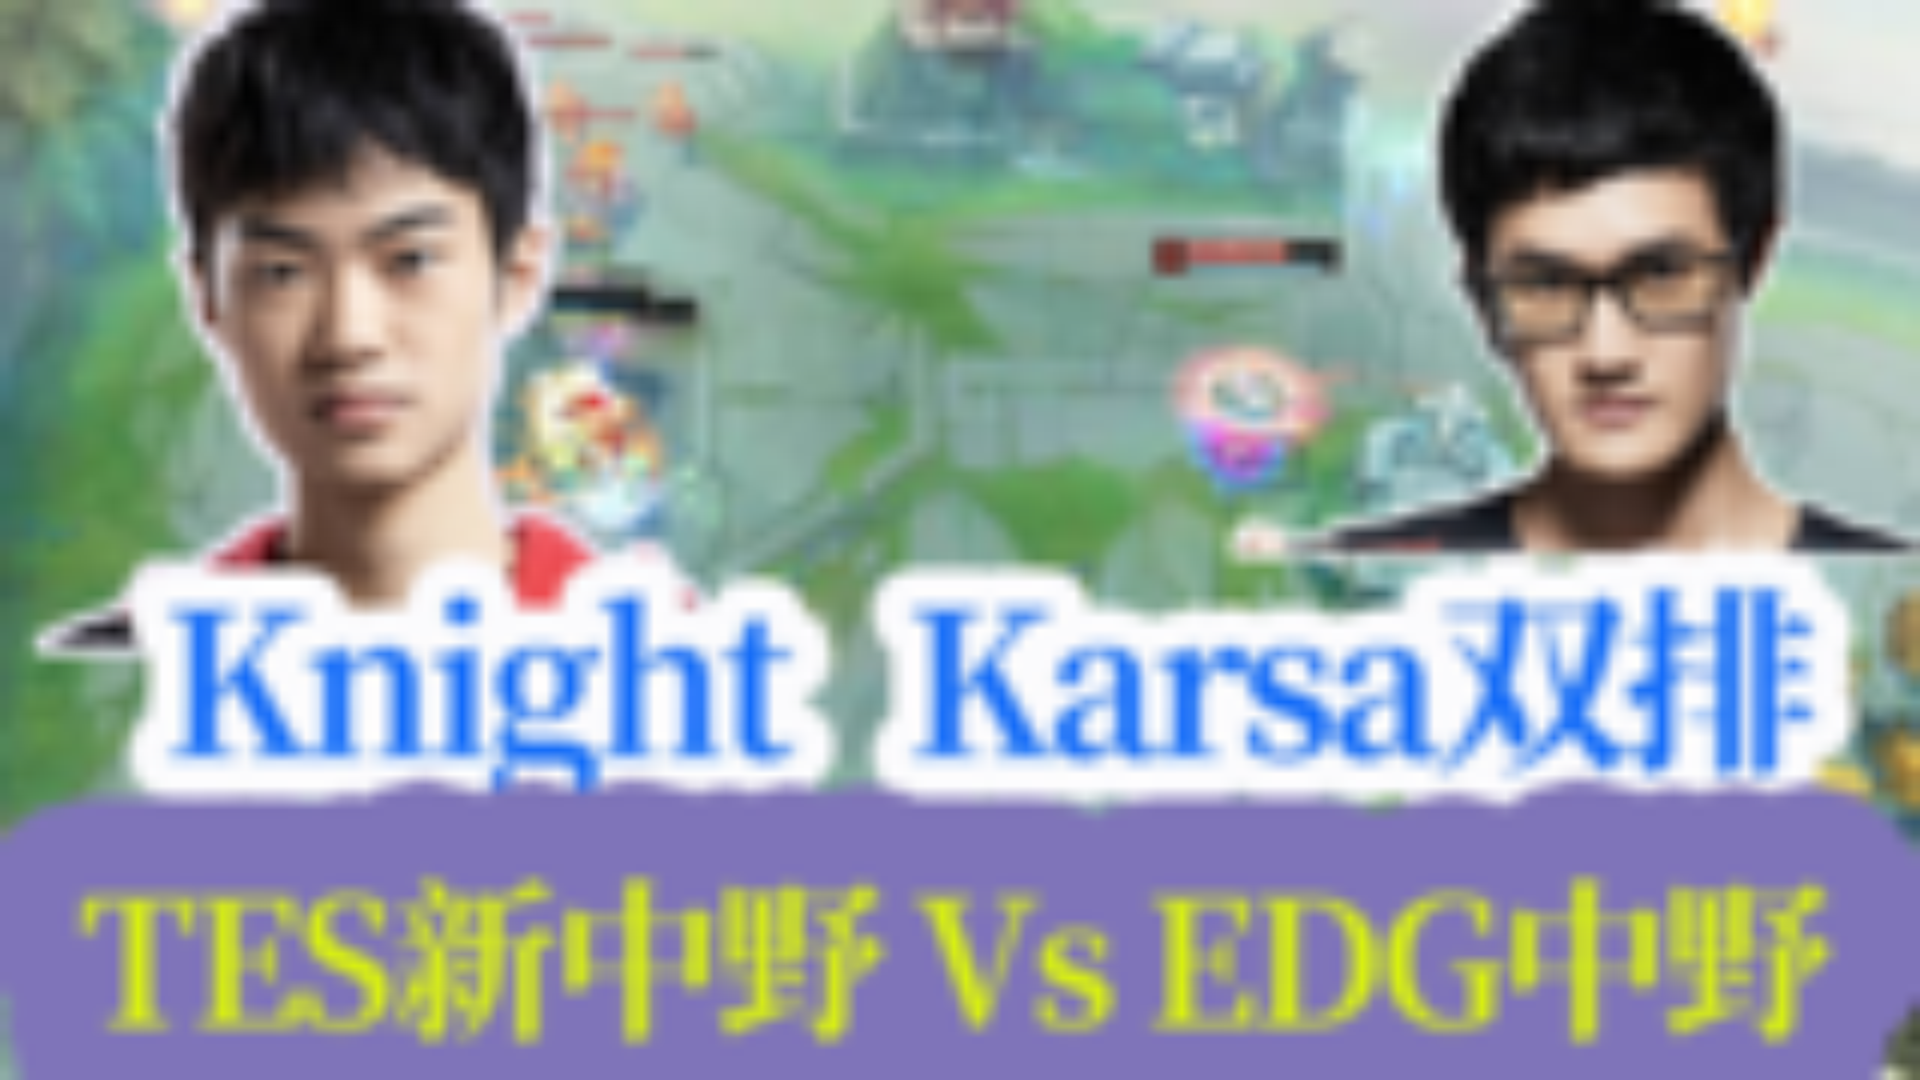 Knight奇亚娜 Karsa酒桶 TES新中野组合韩服狠狠压制EDG中野